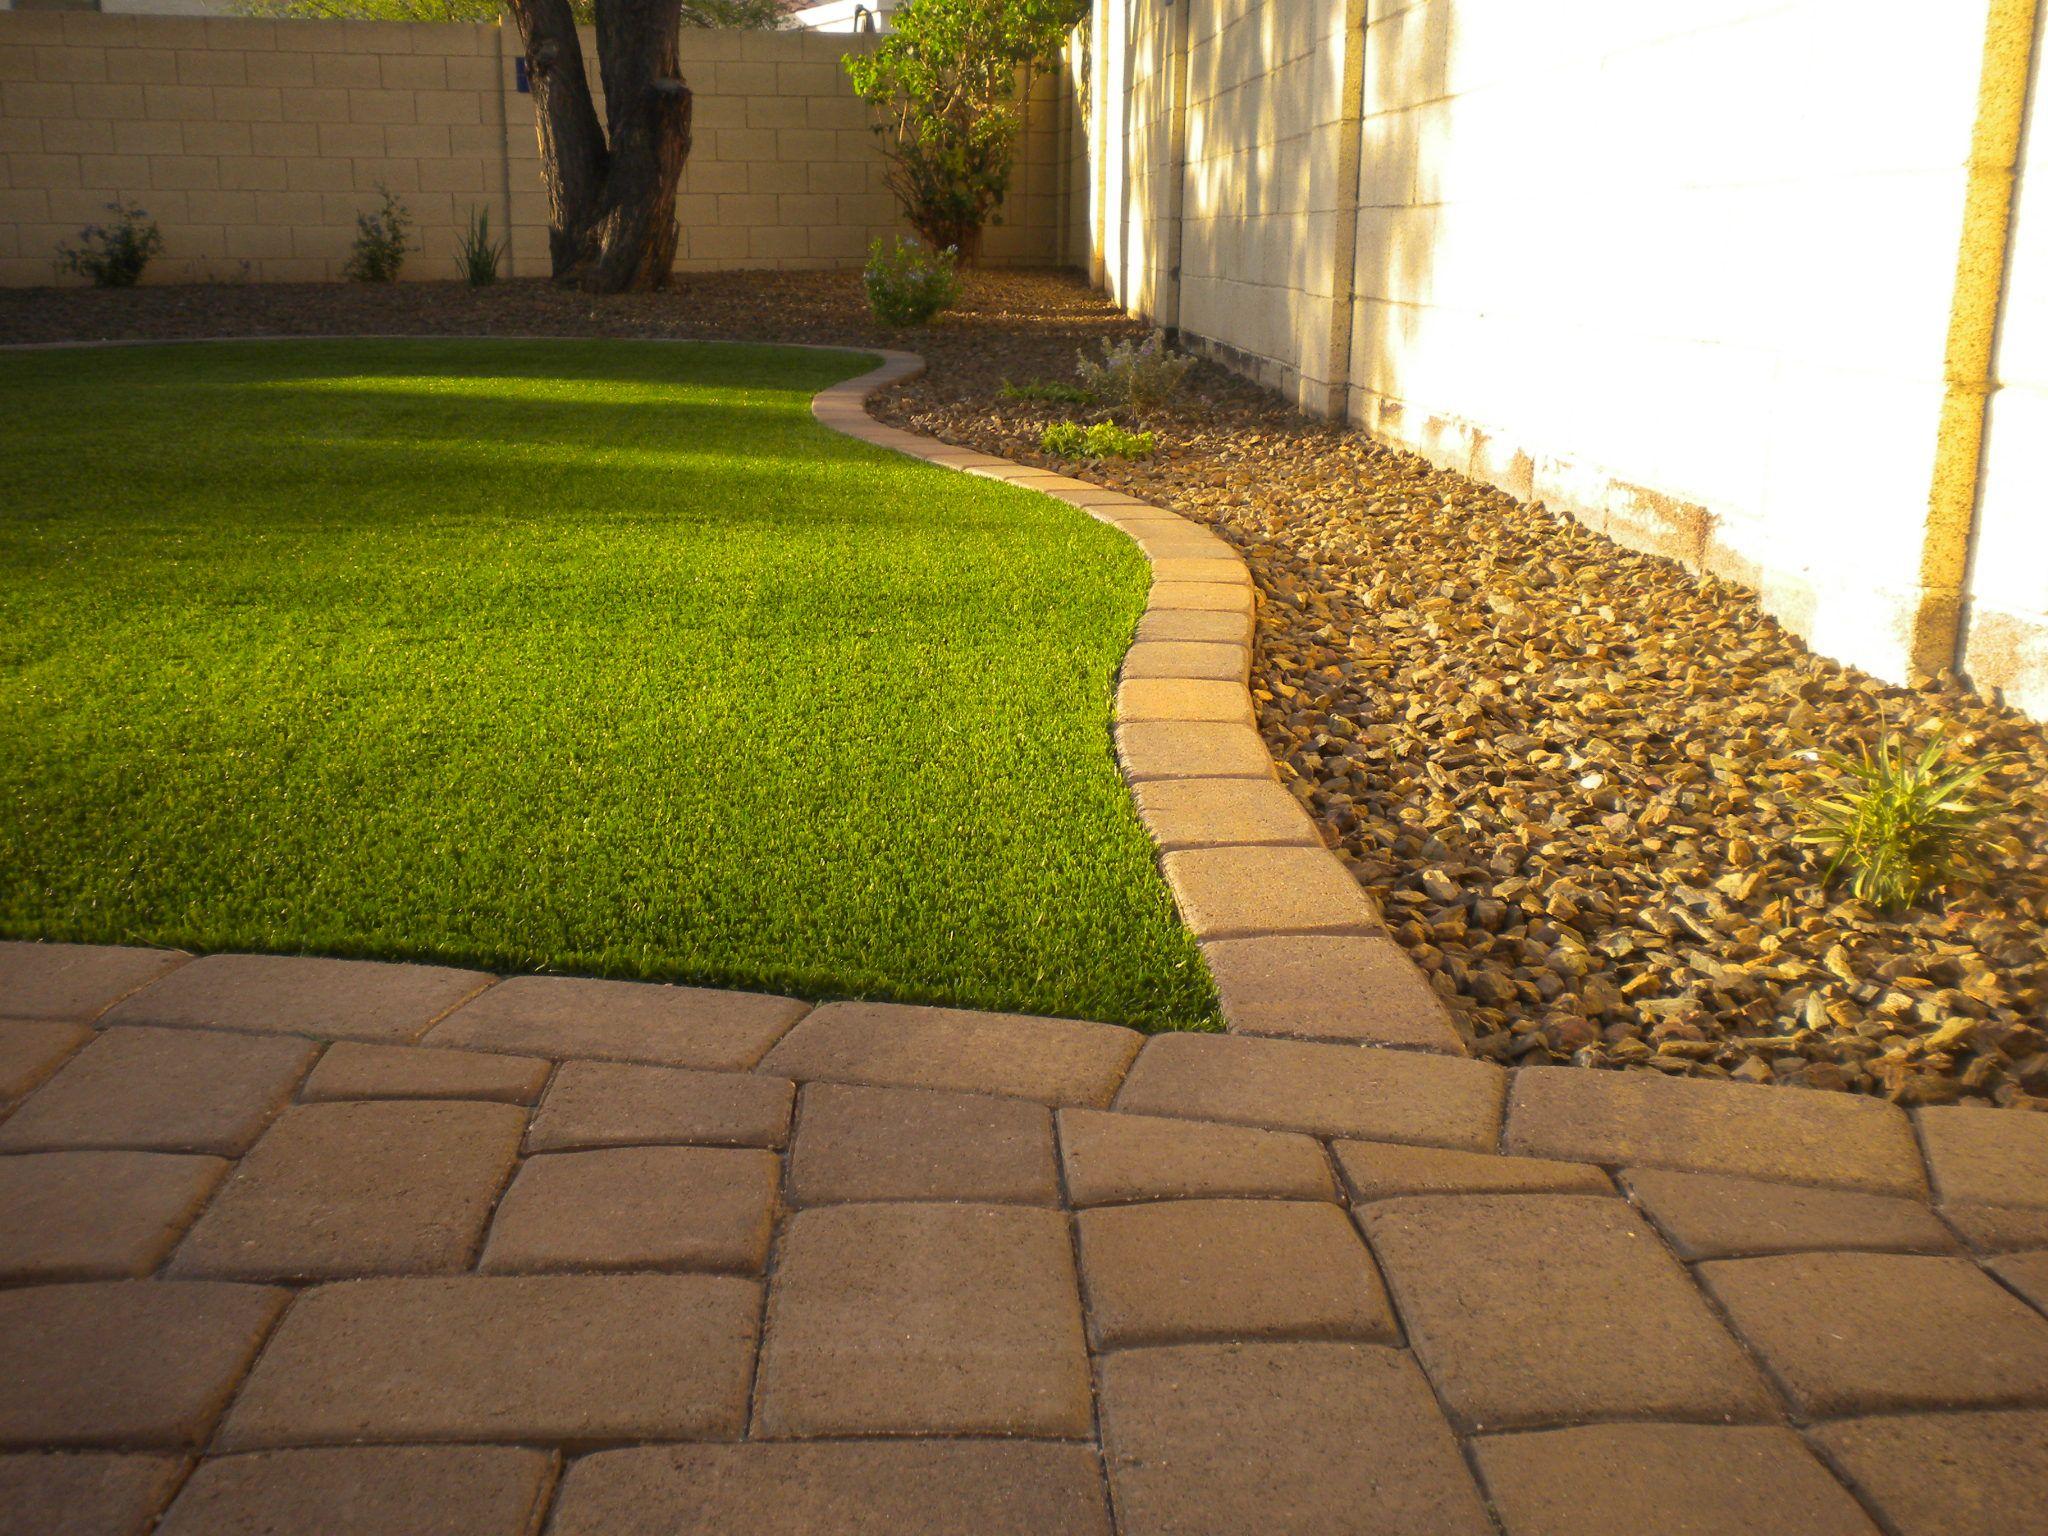 Artificial Turf & Pavers | Artificial Grass Landscaping | Pinterest ...